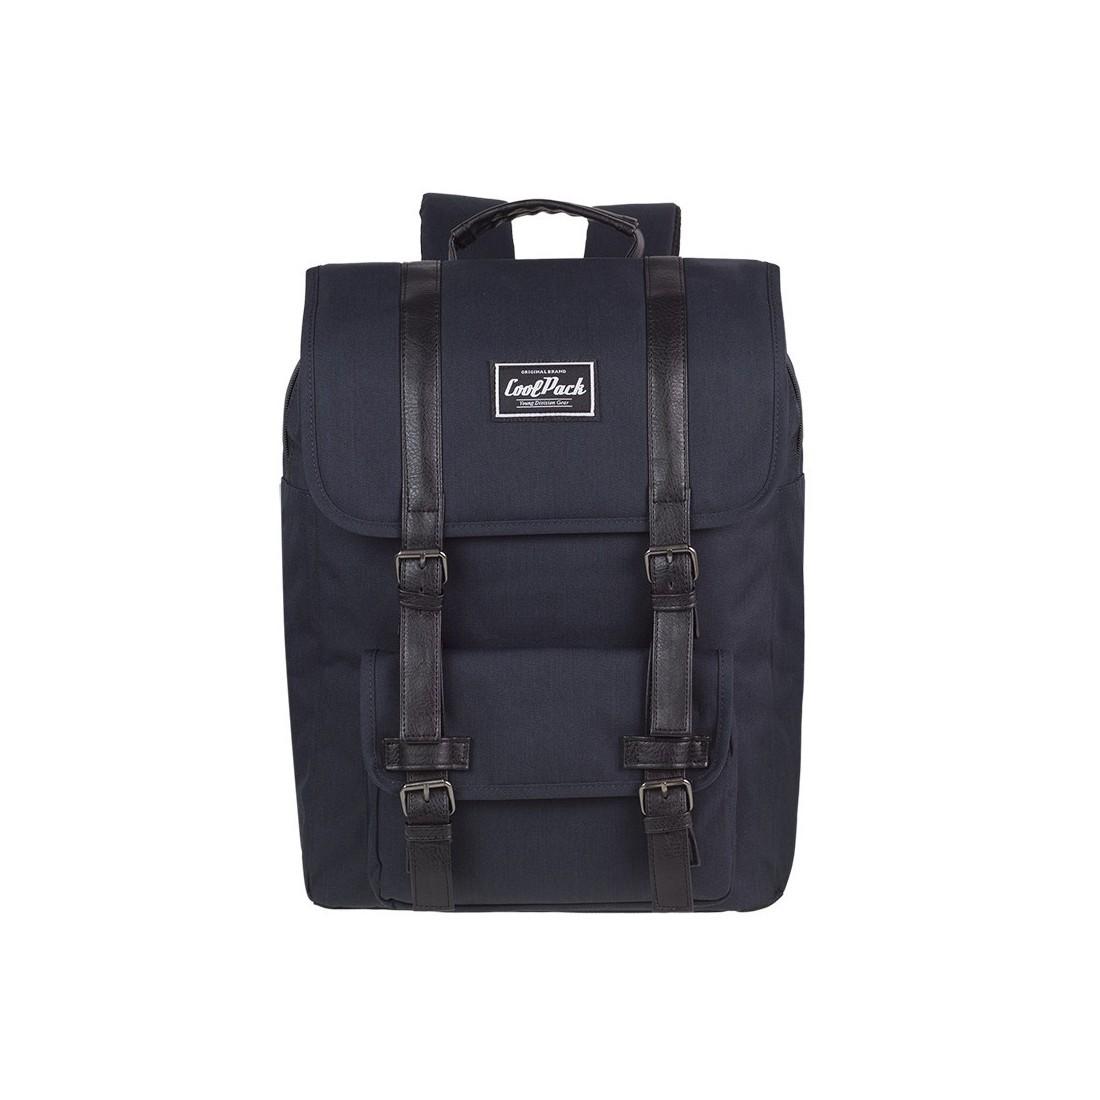 Plecak miejski CoolPack CP TRAFFIC BLACK czarny retro kieszeń na laptop A132